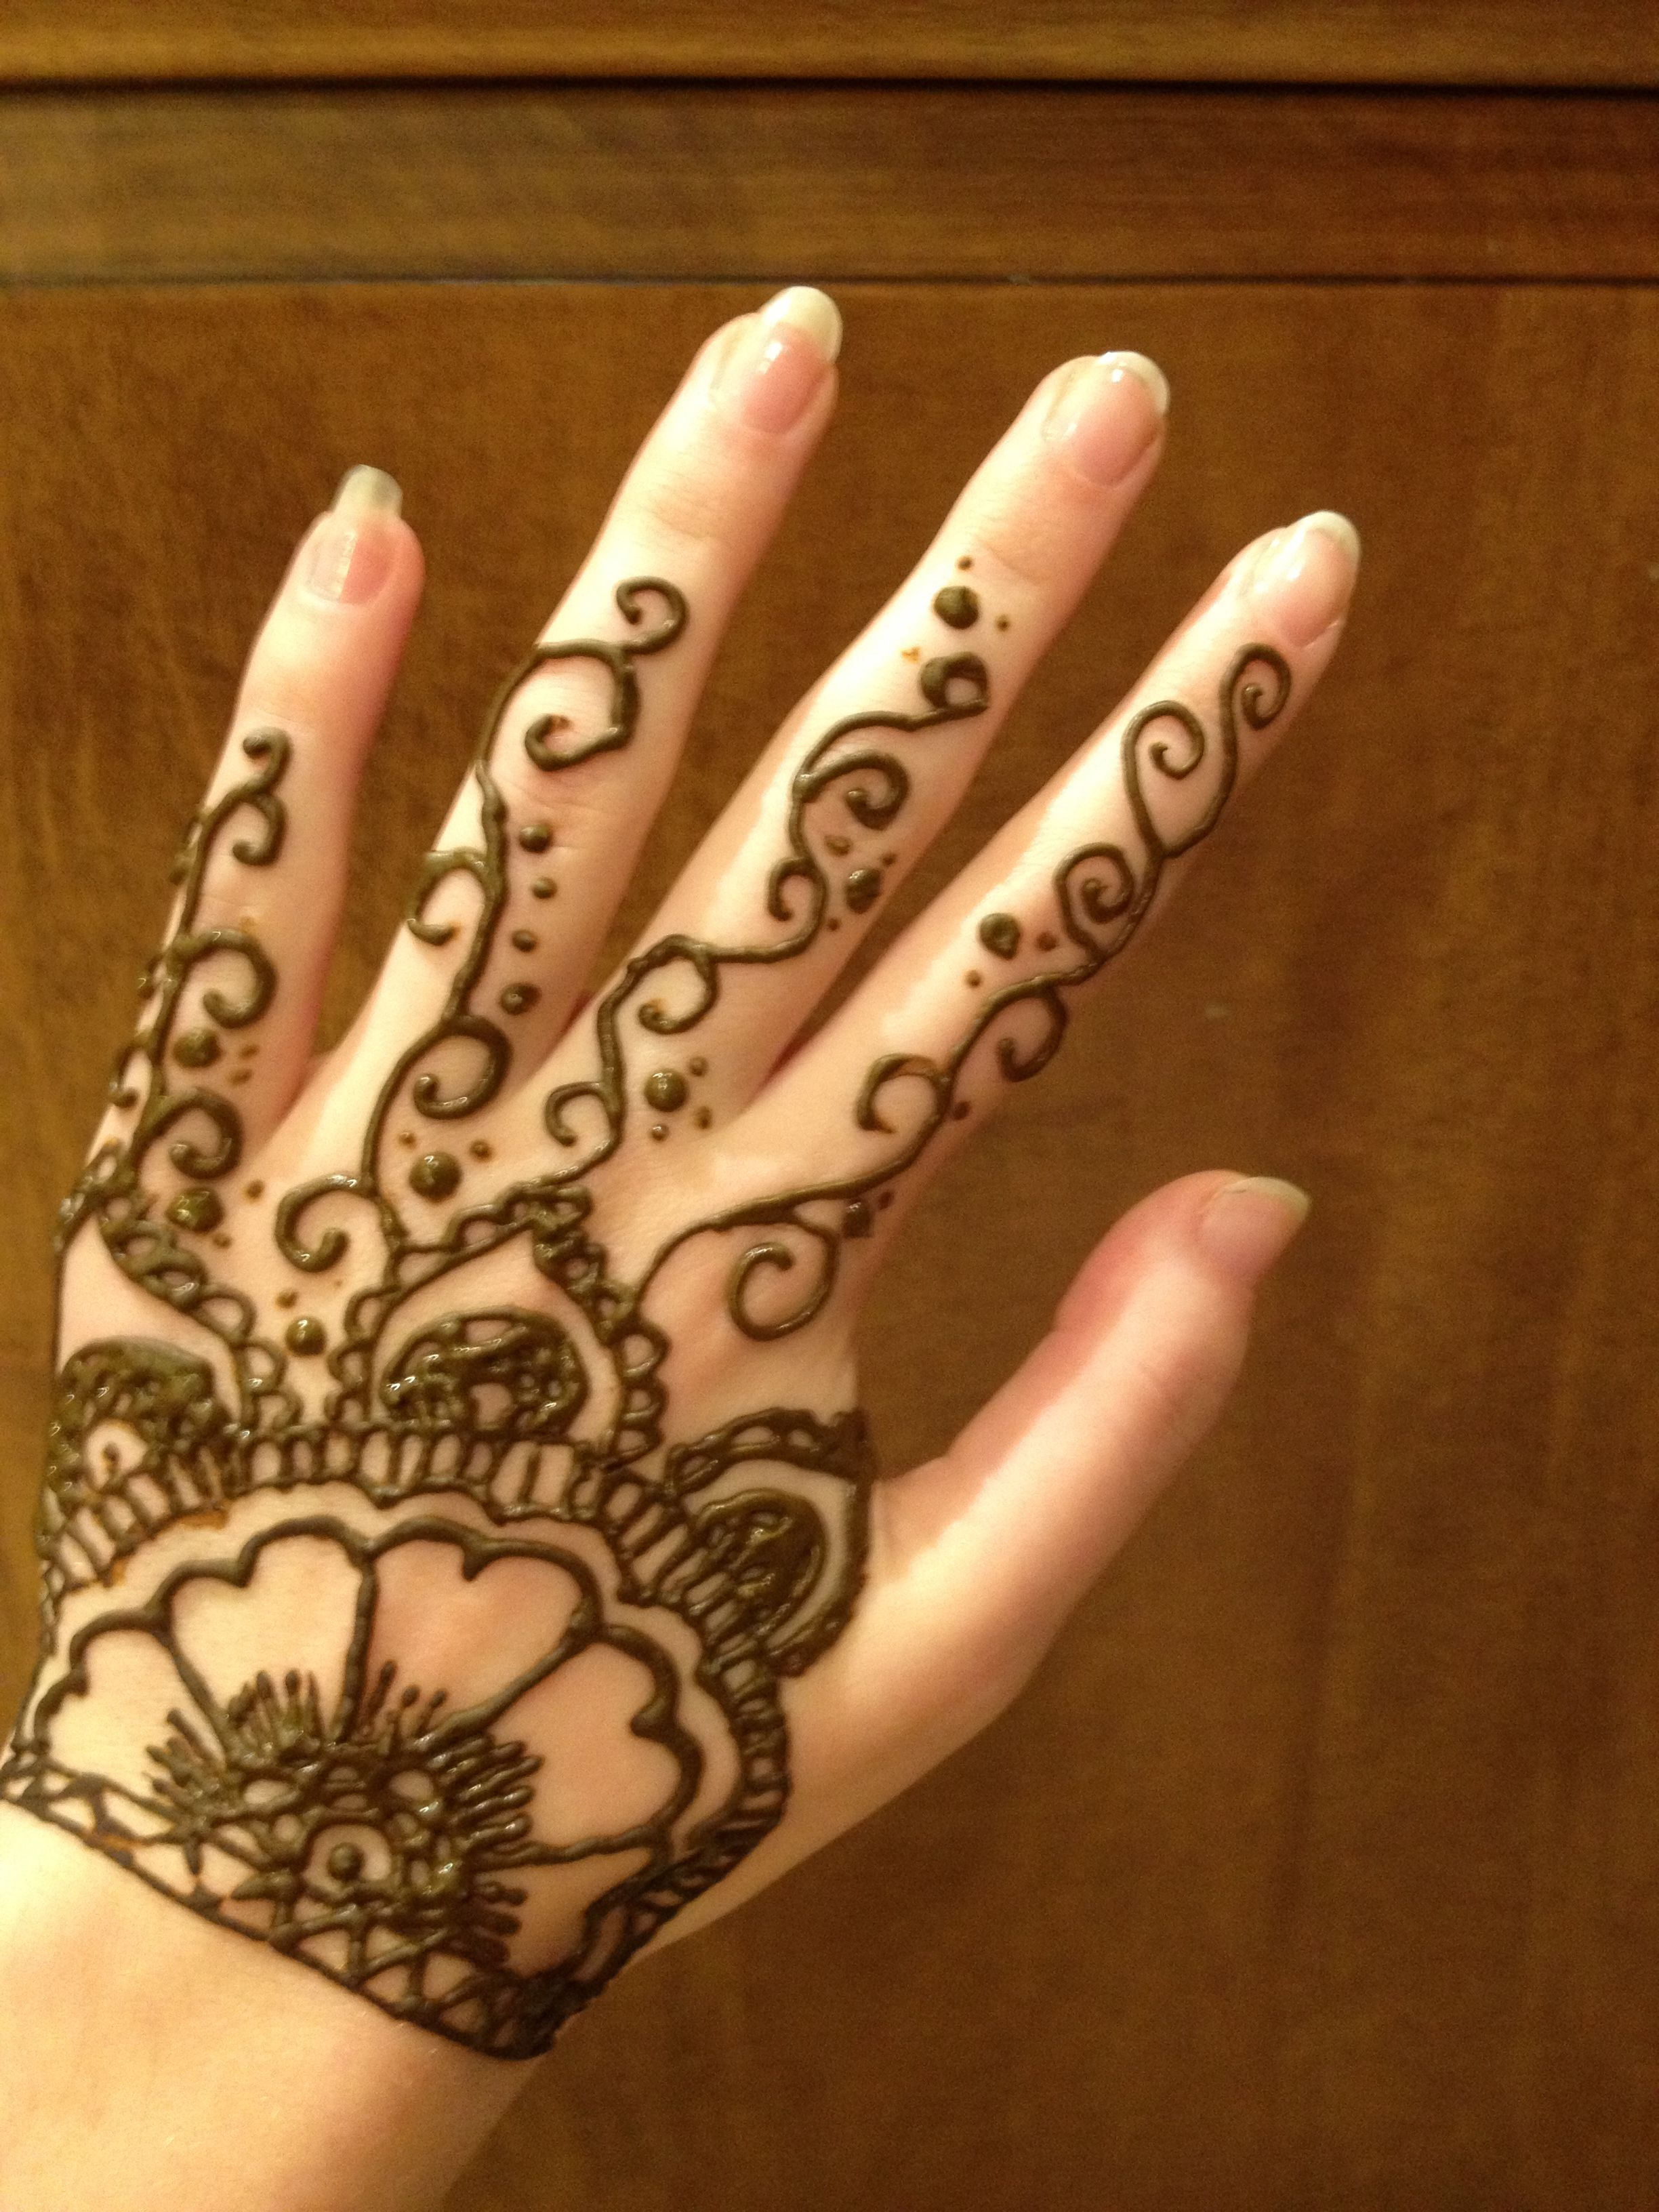 Cool hand henna uhair etcu pinterest hand henna and hennas